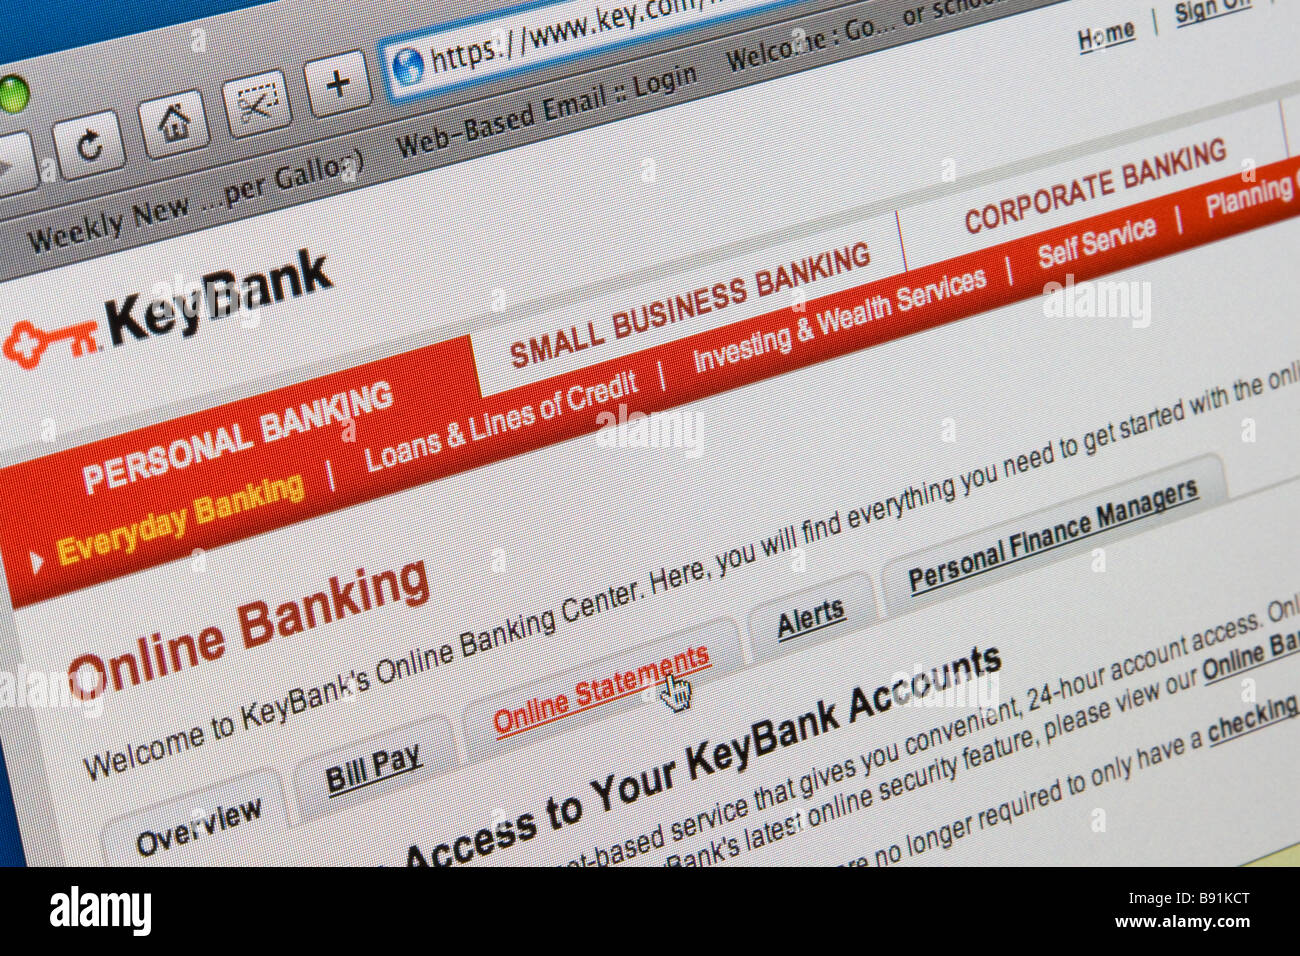 Online Banking Website Online Stock Photos & Online Banking